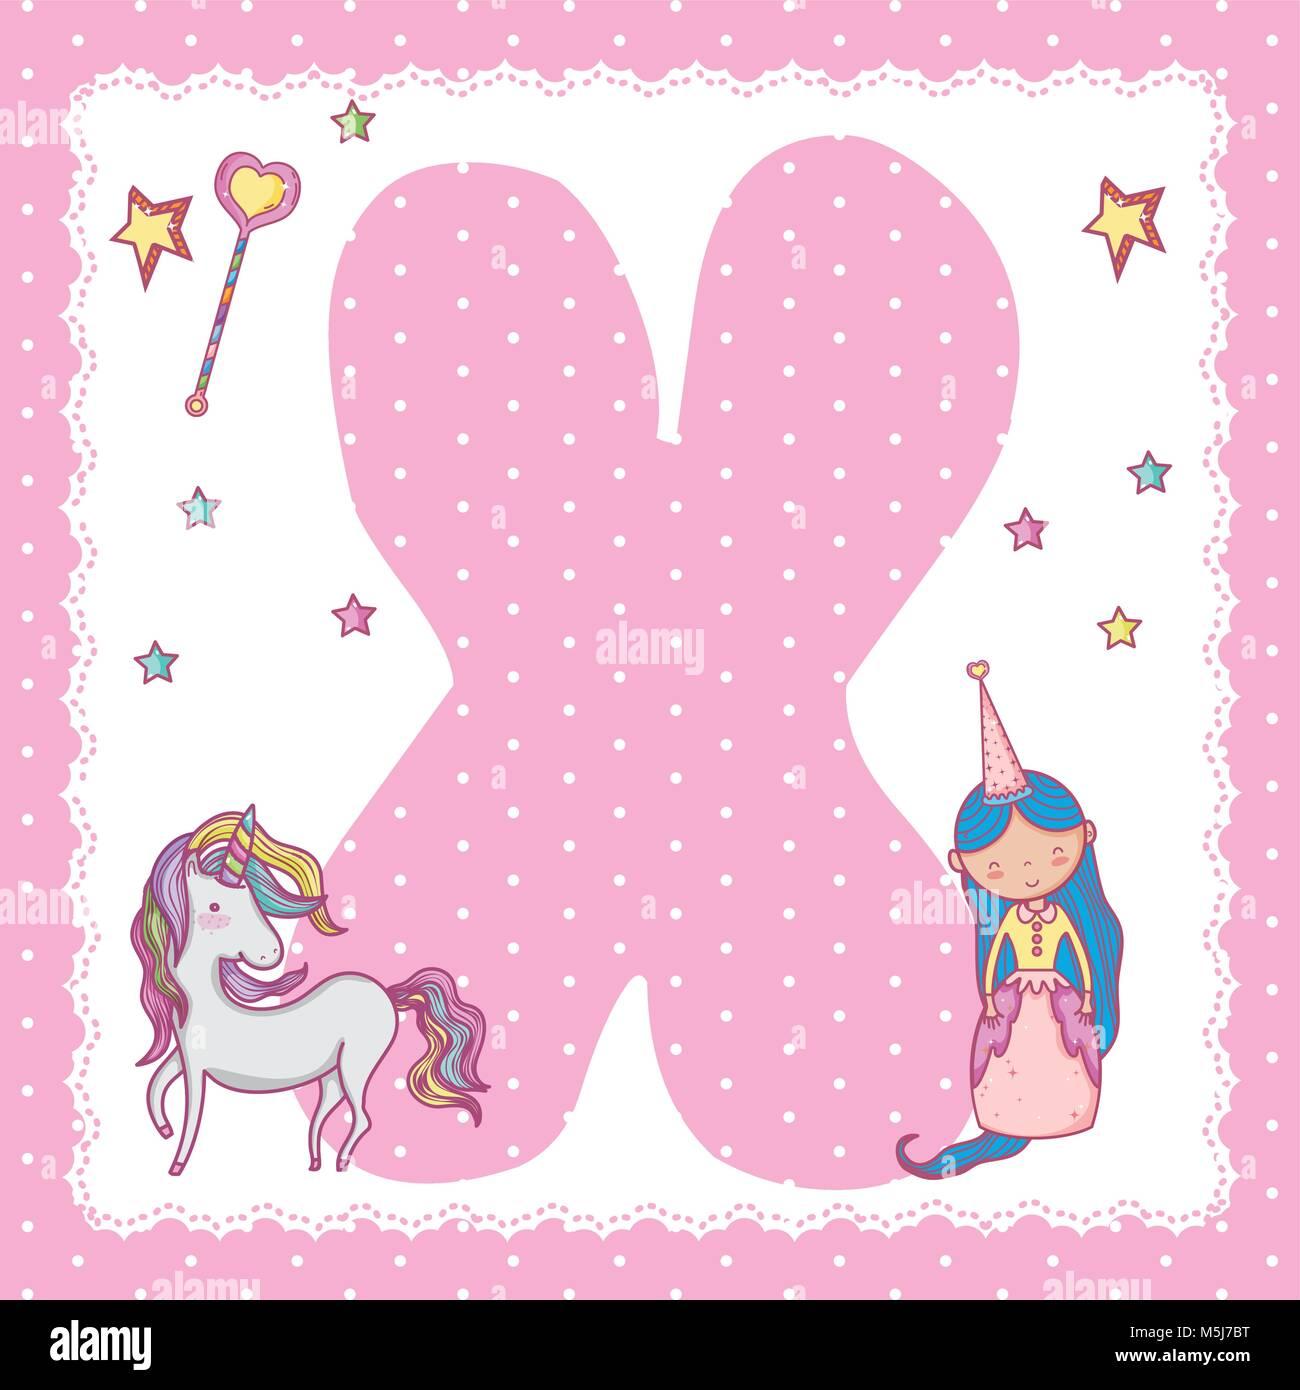 Cartoon Letter X Stock Photos & Cartoon Letter X Stock Images - Alamy